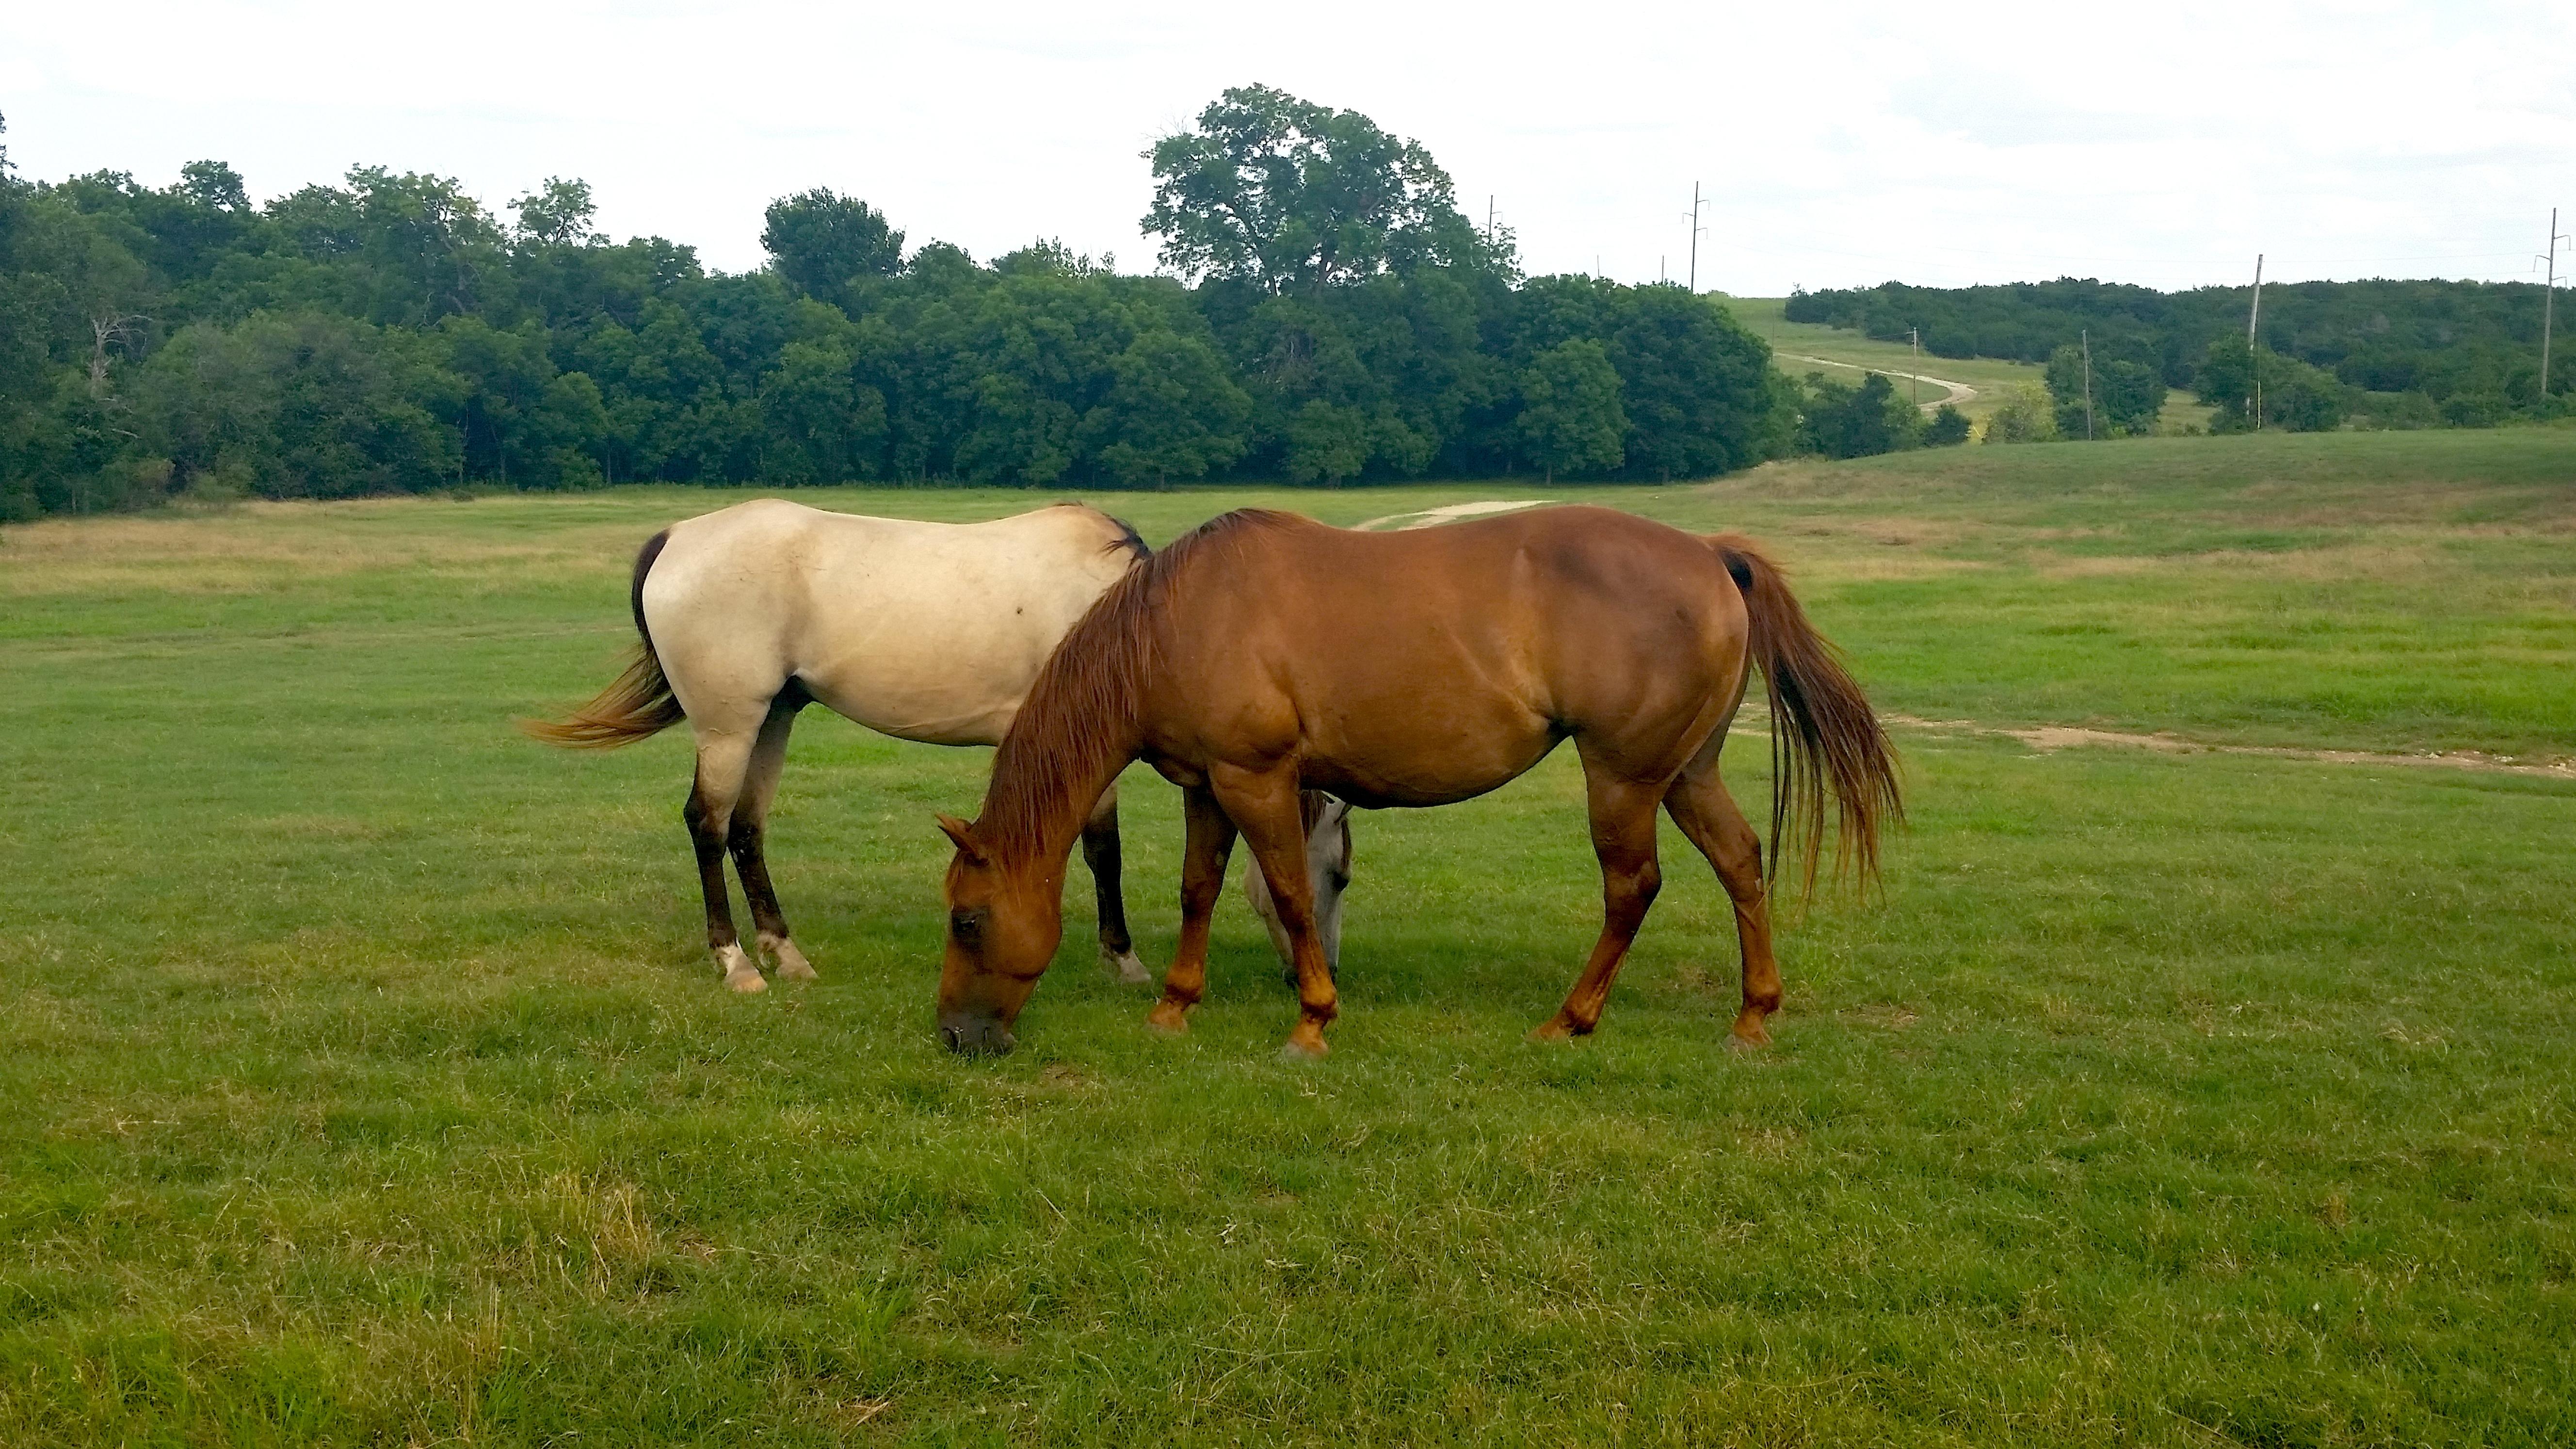 Equine Health: Deworming Horses